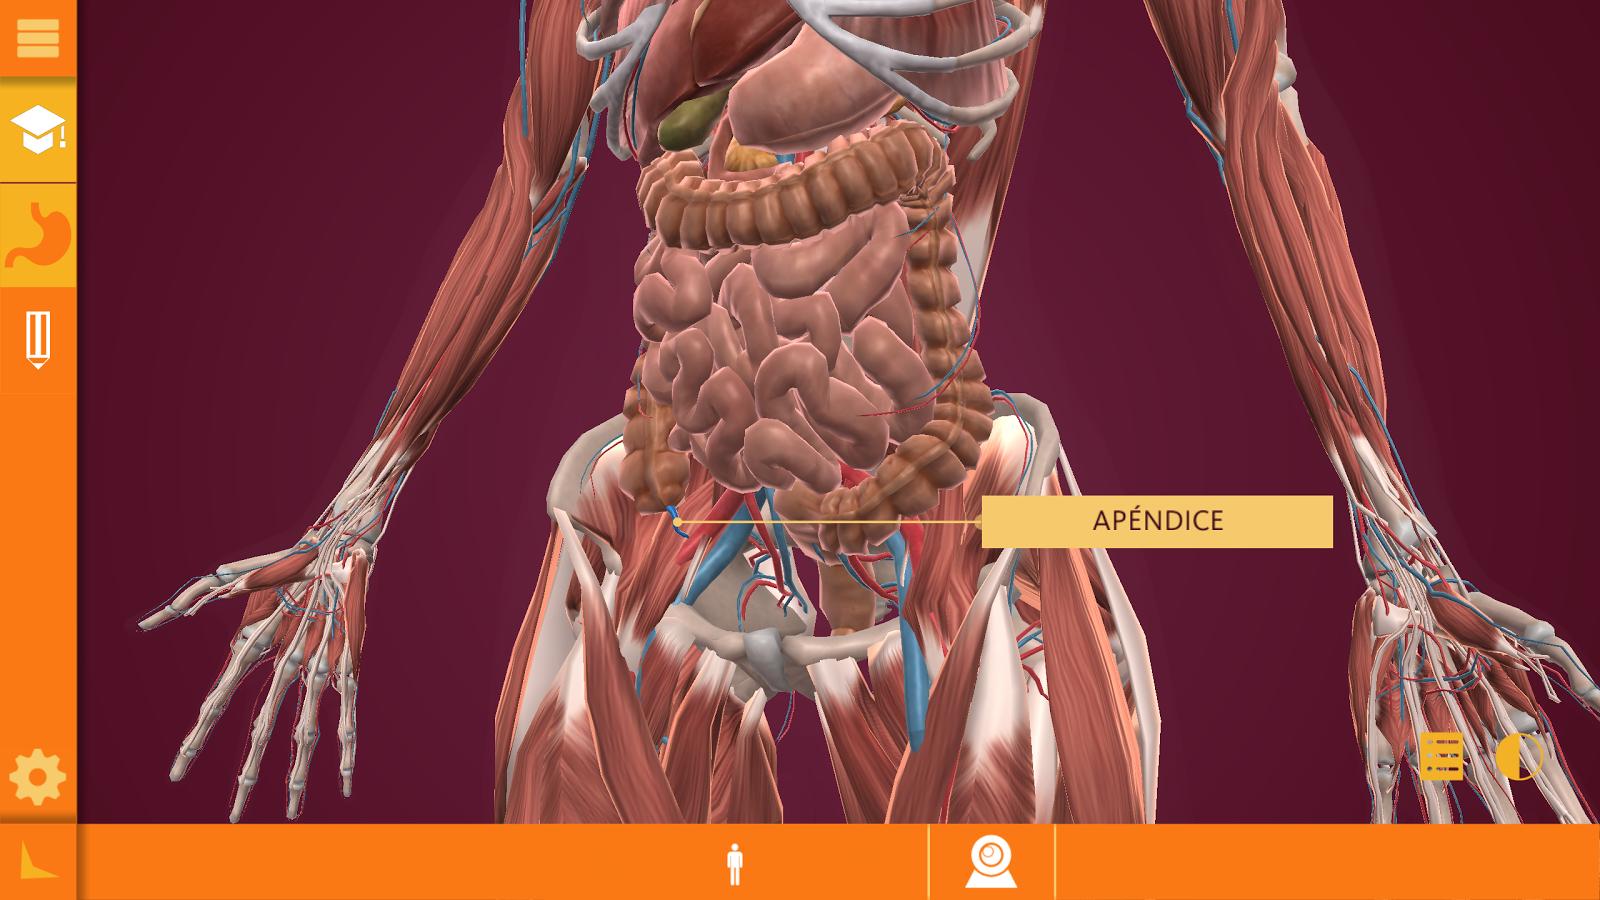 Arloon Anatomy #app #android | Android Ciencias | Pinterest